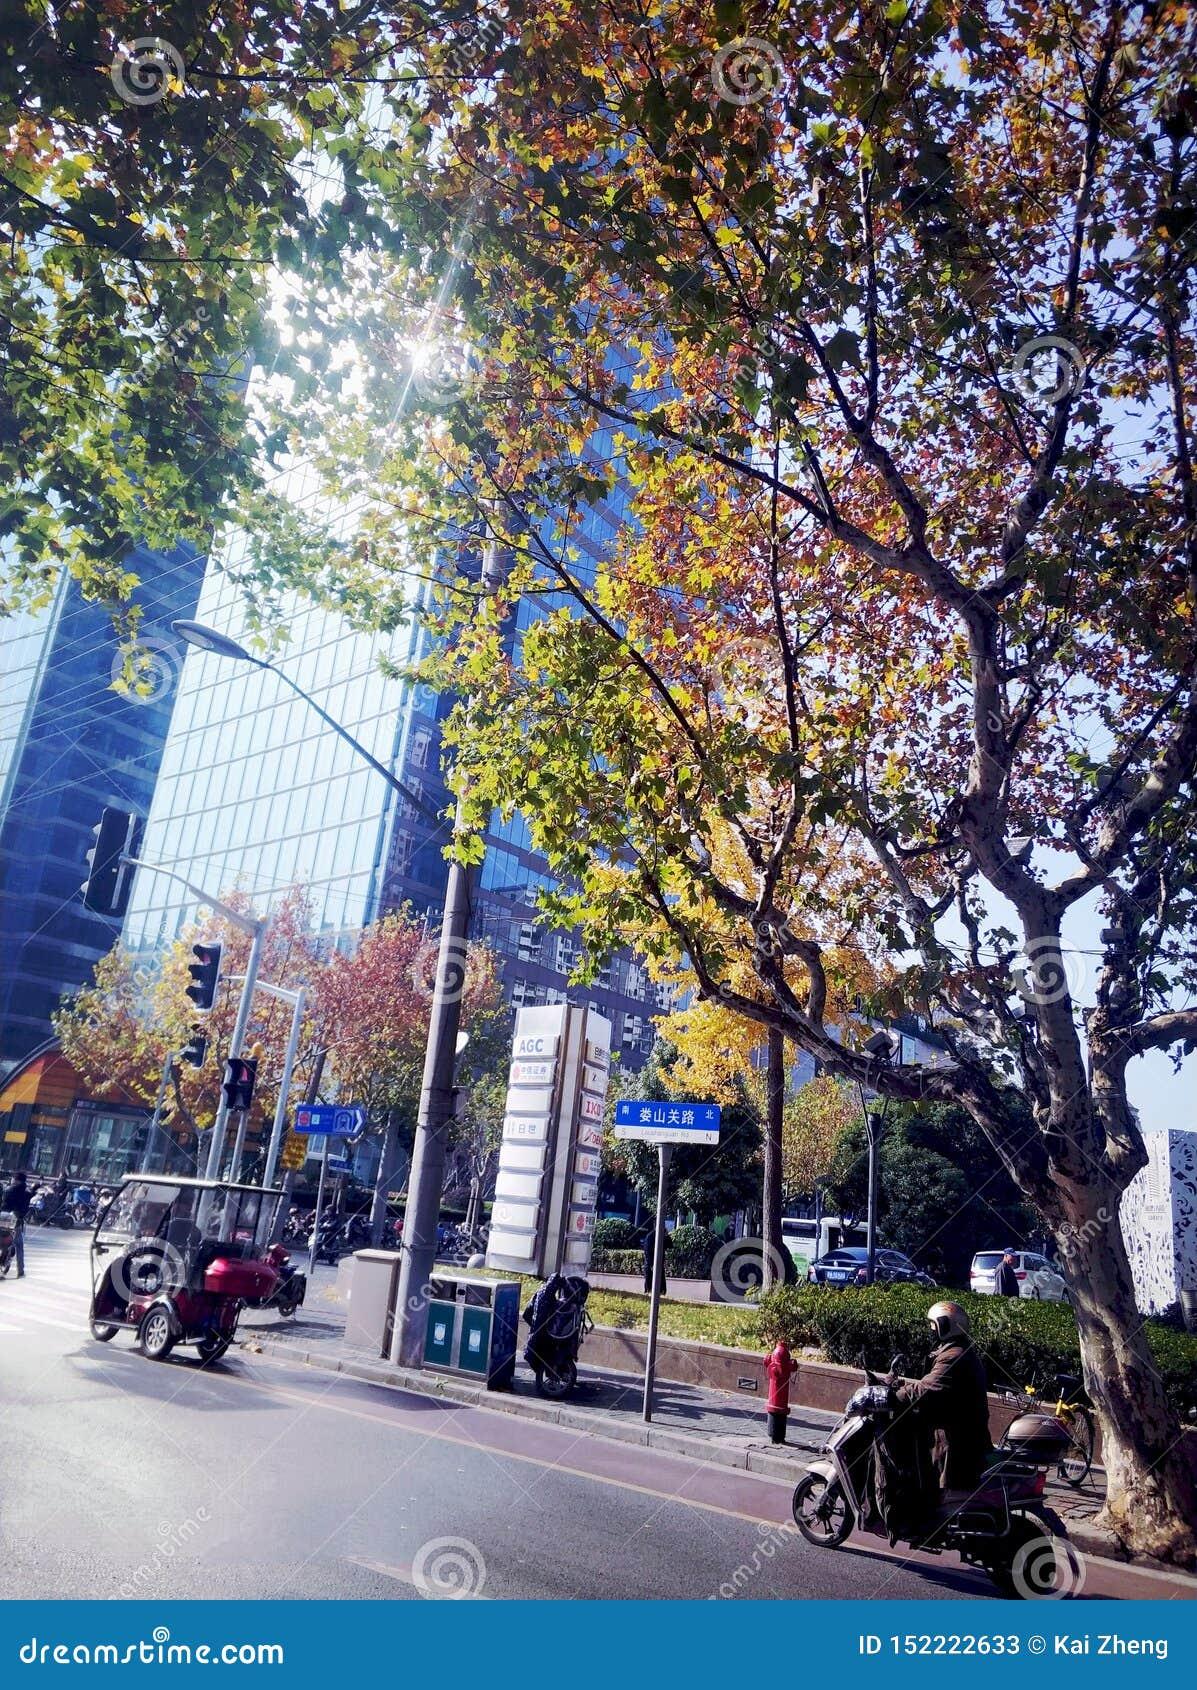 ? WinterMorining del ?de RealChina-UrbanCityShanghai5-